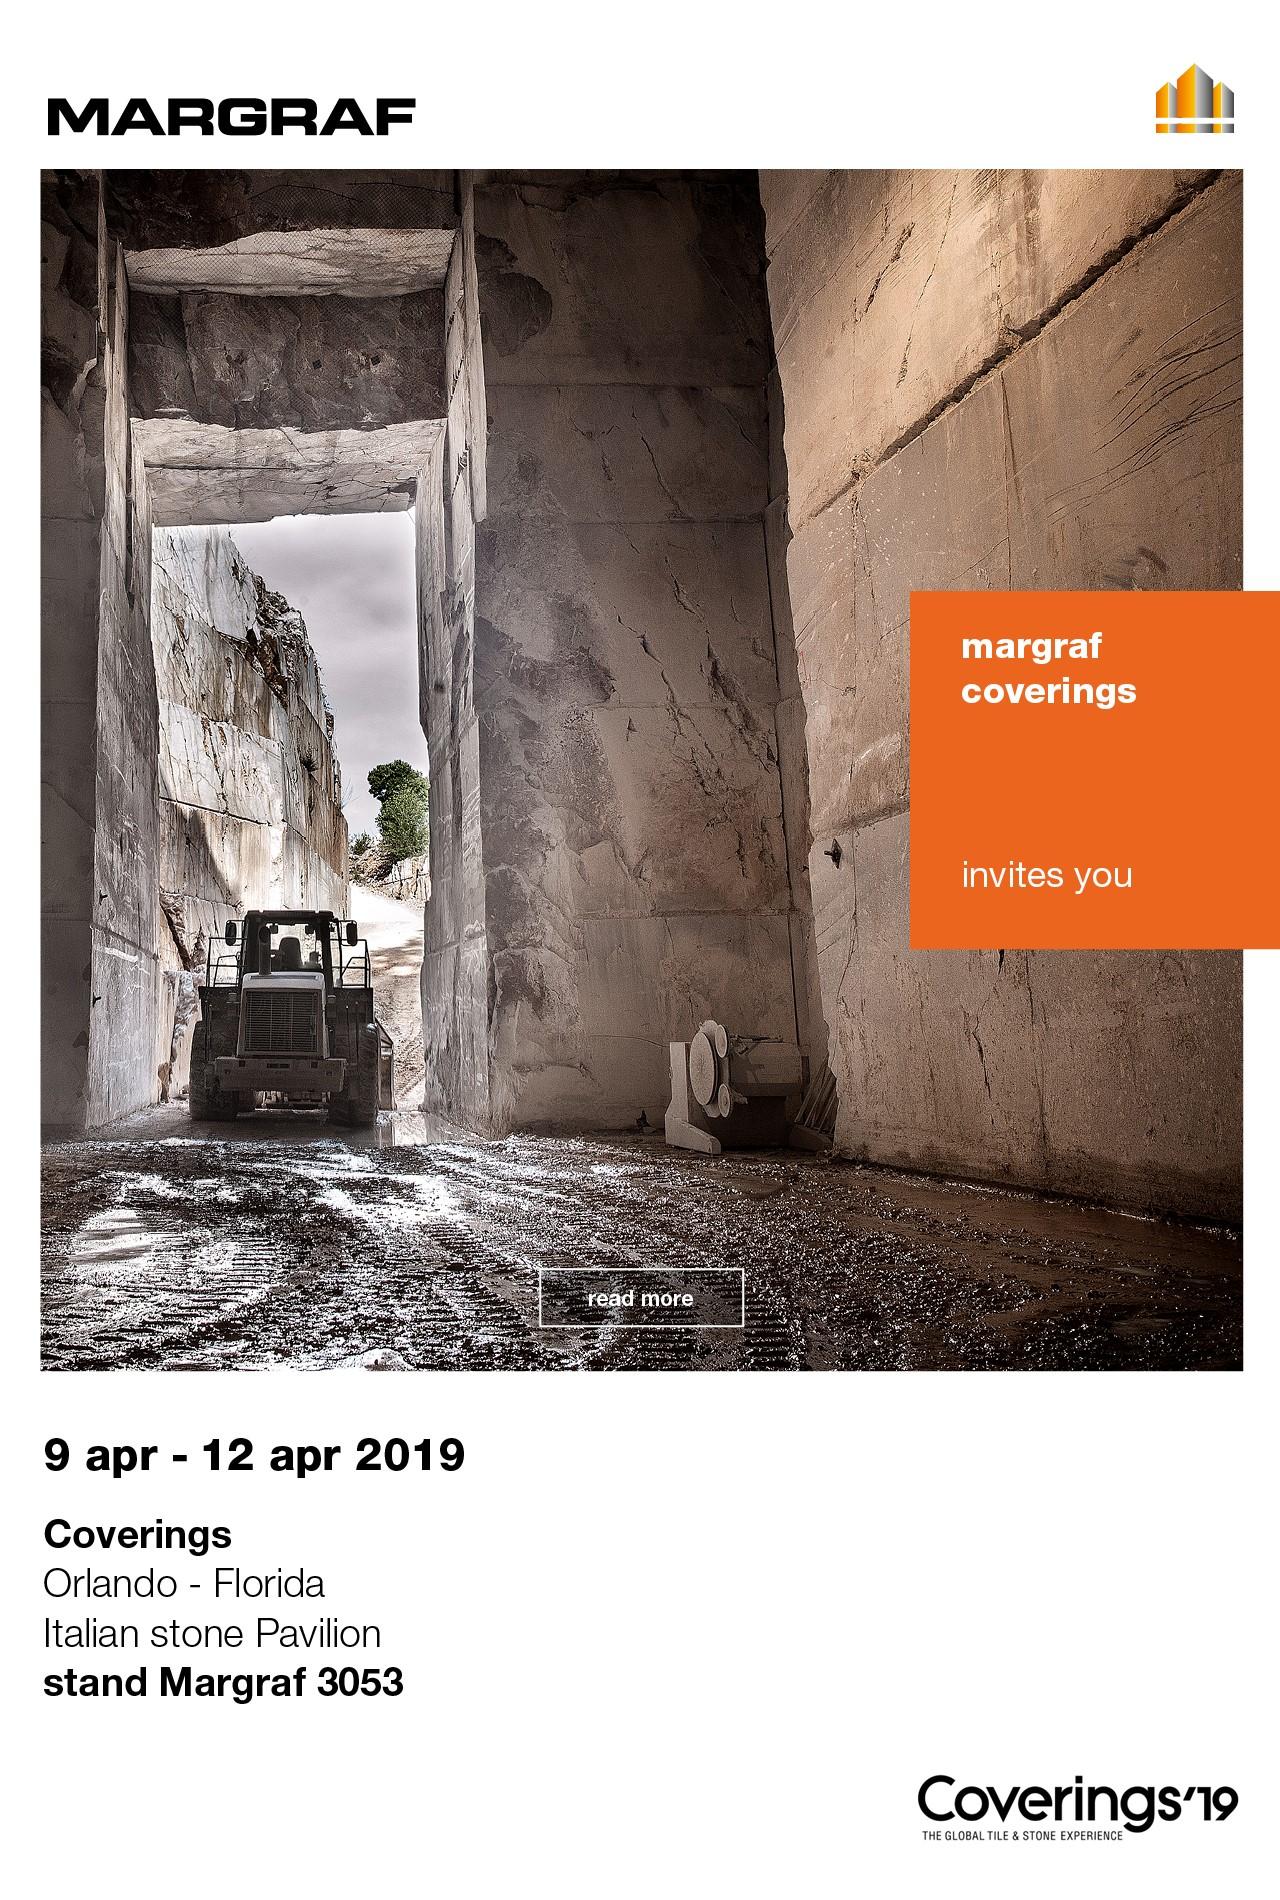 Margraf_invitation_Coverings_2019